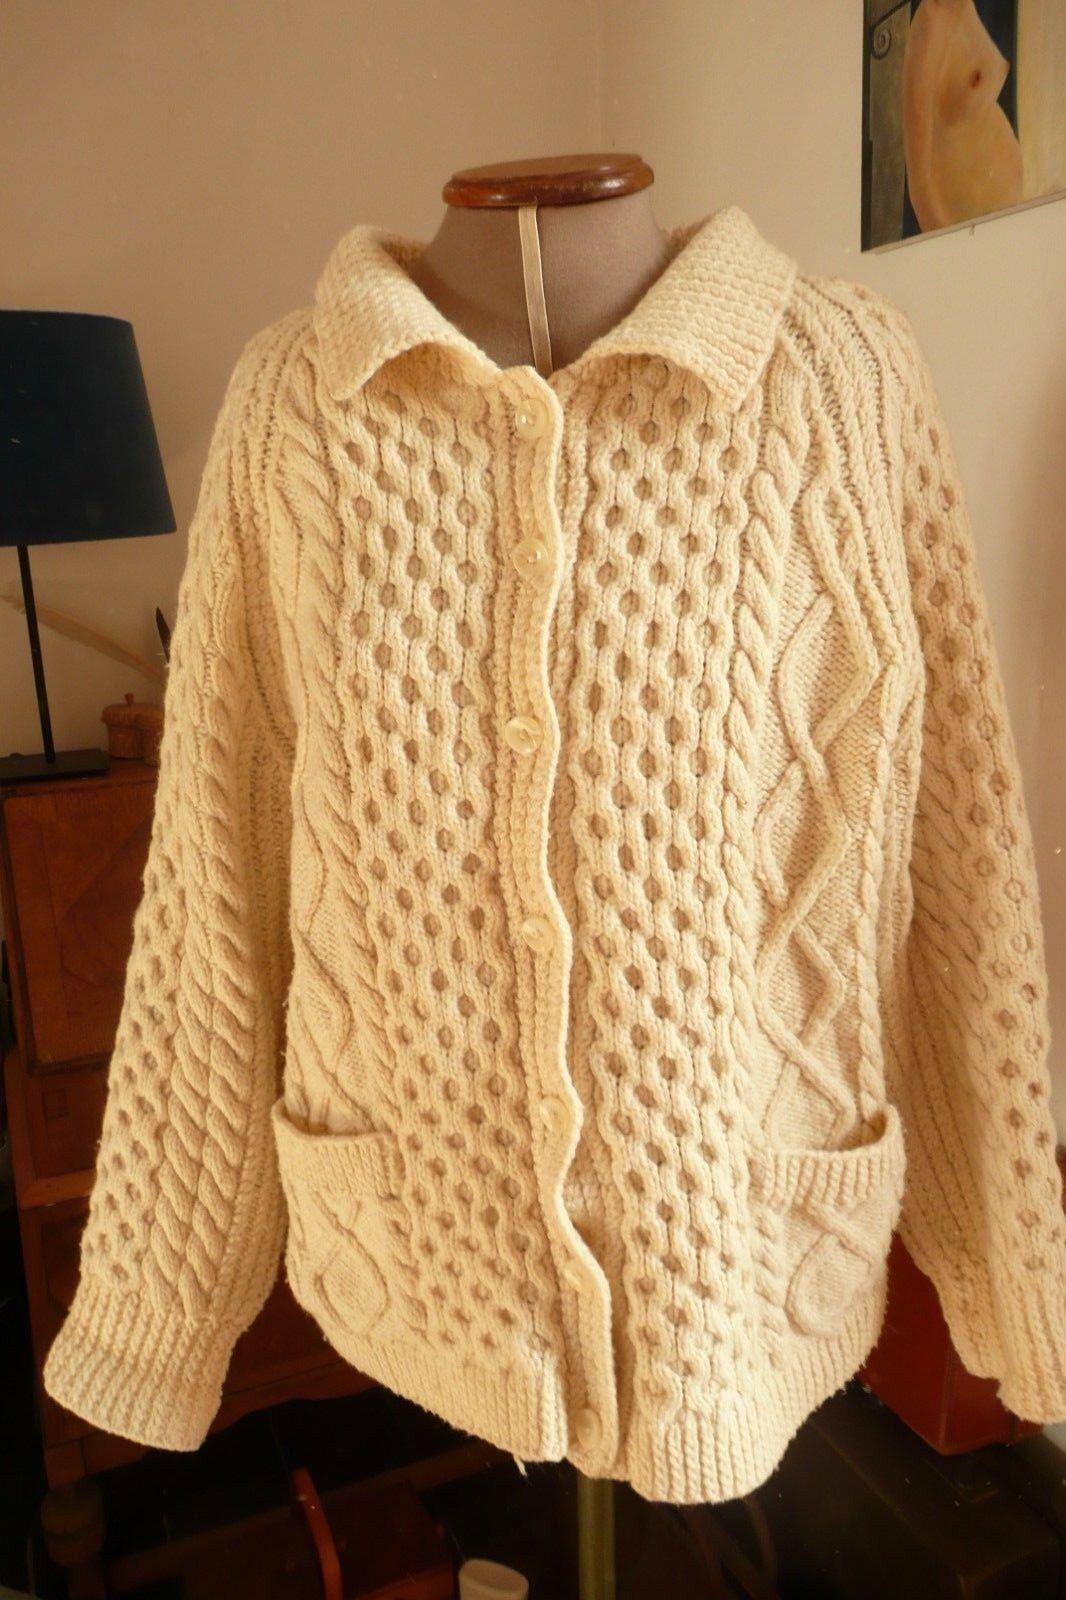 Vintage Tejido a Mano Crema Aran Cable Tejido Cardigan Cardigan Cardigan De Gran Tamaño Gruesa encaja 10-18 0f34d9